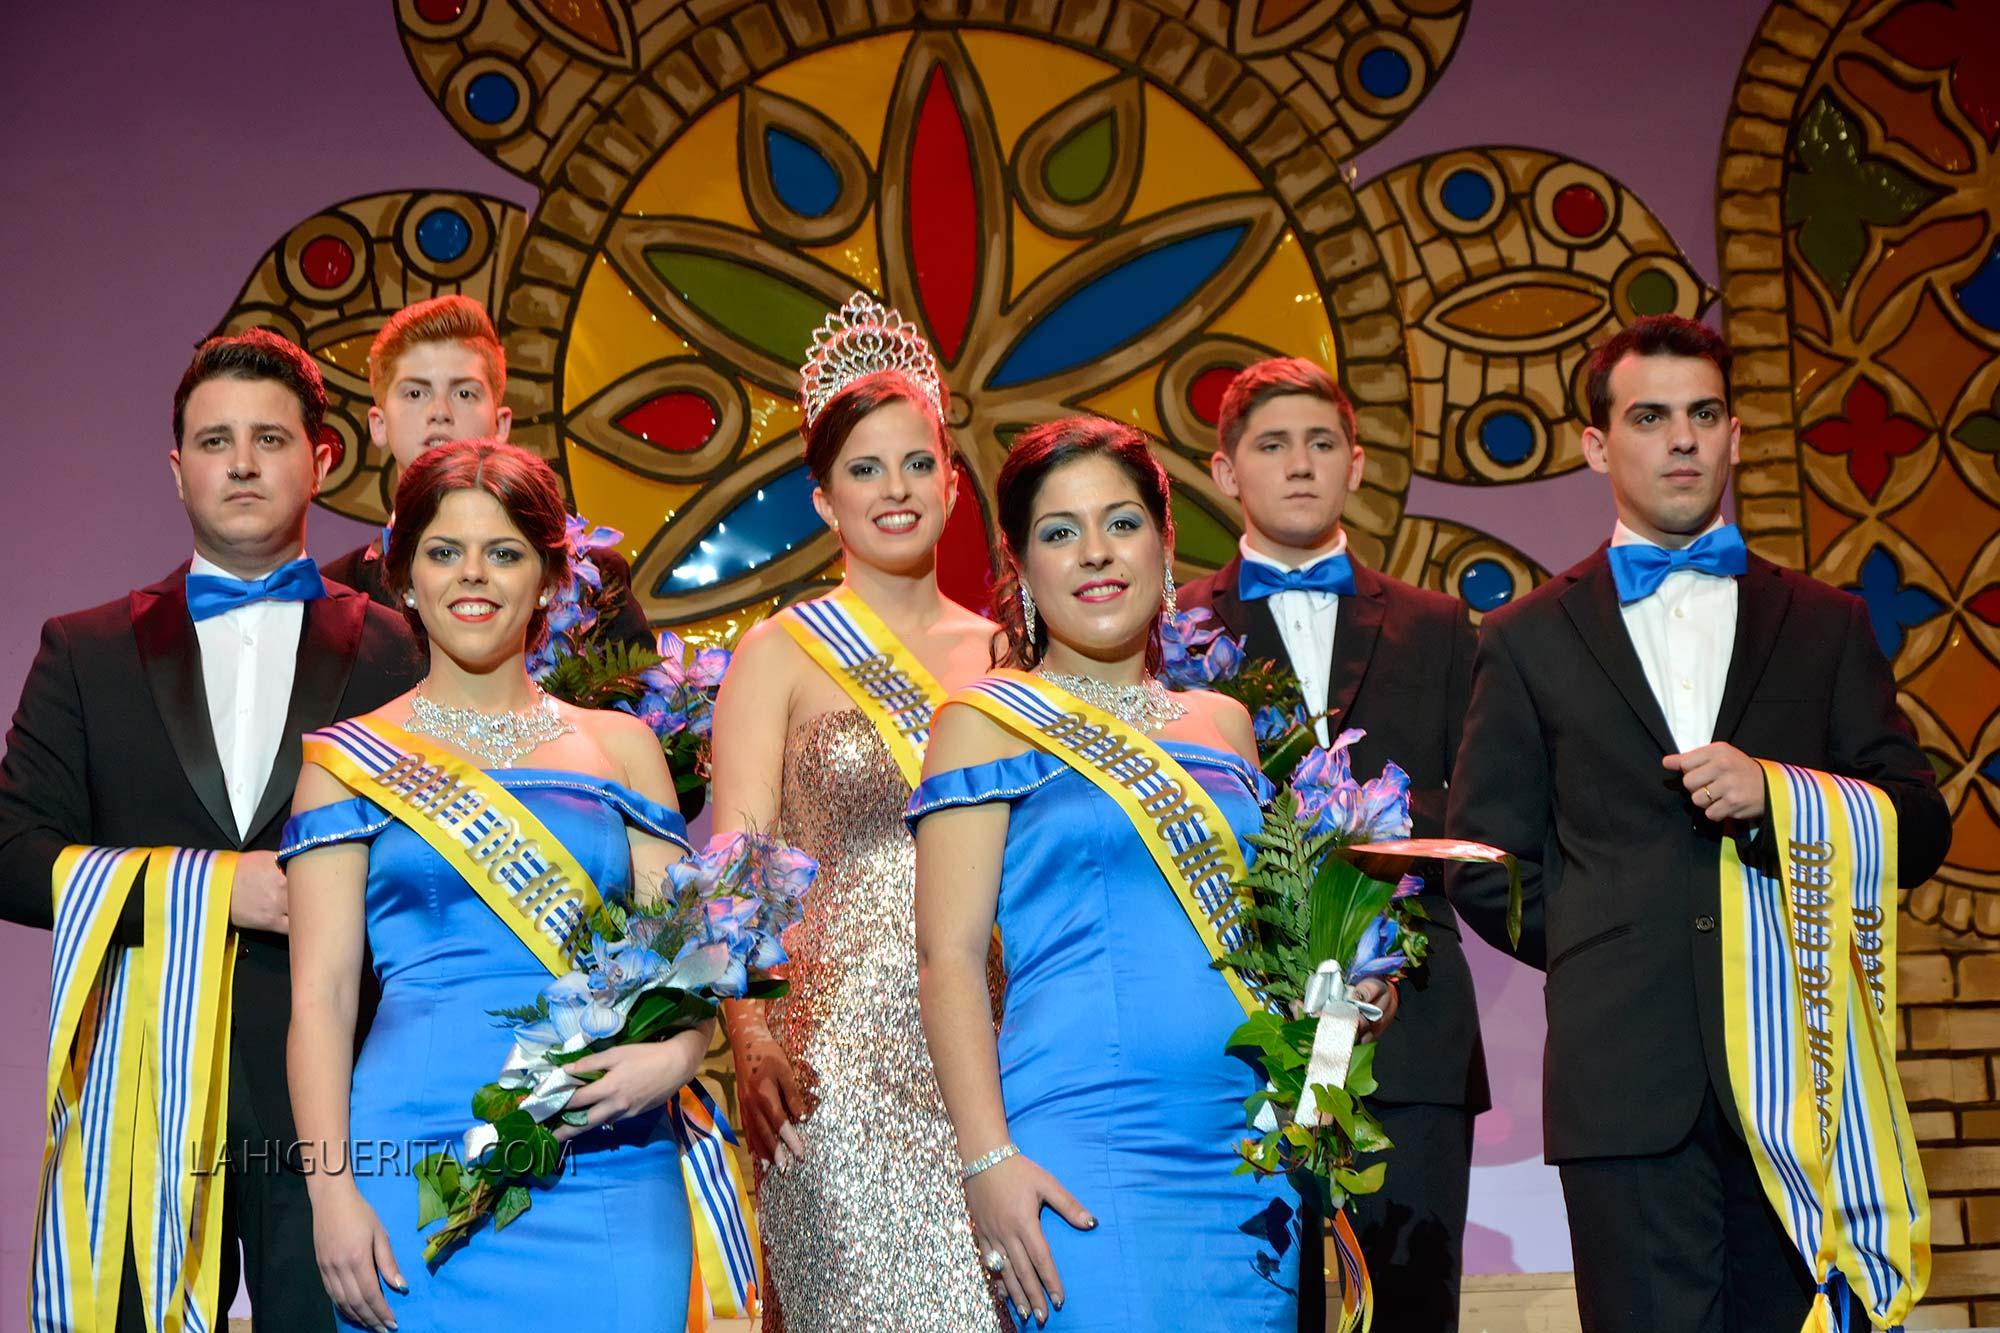 Coronacion juvenil carnaval isla cristina 2016 _DSC2462